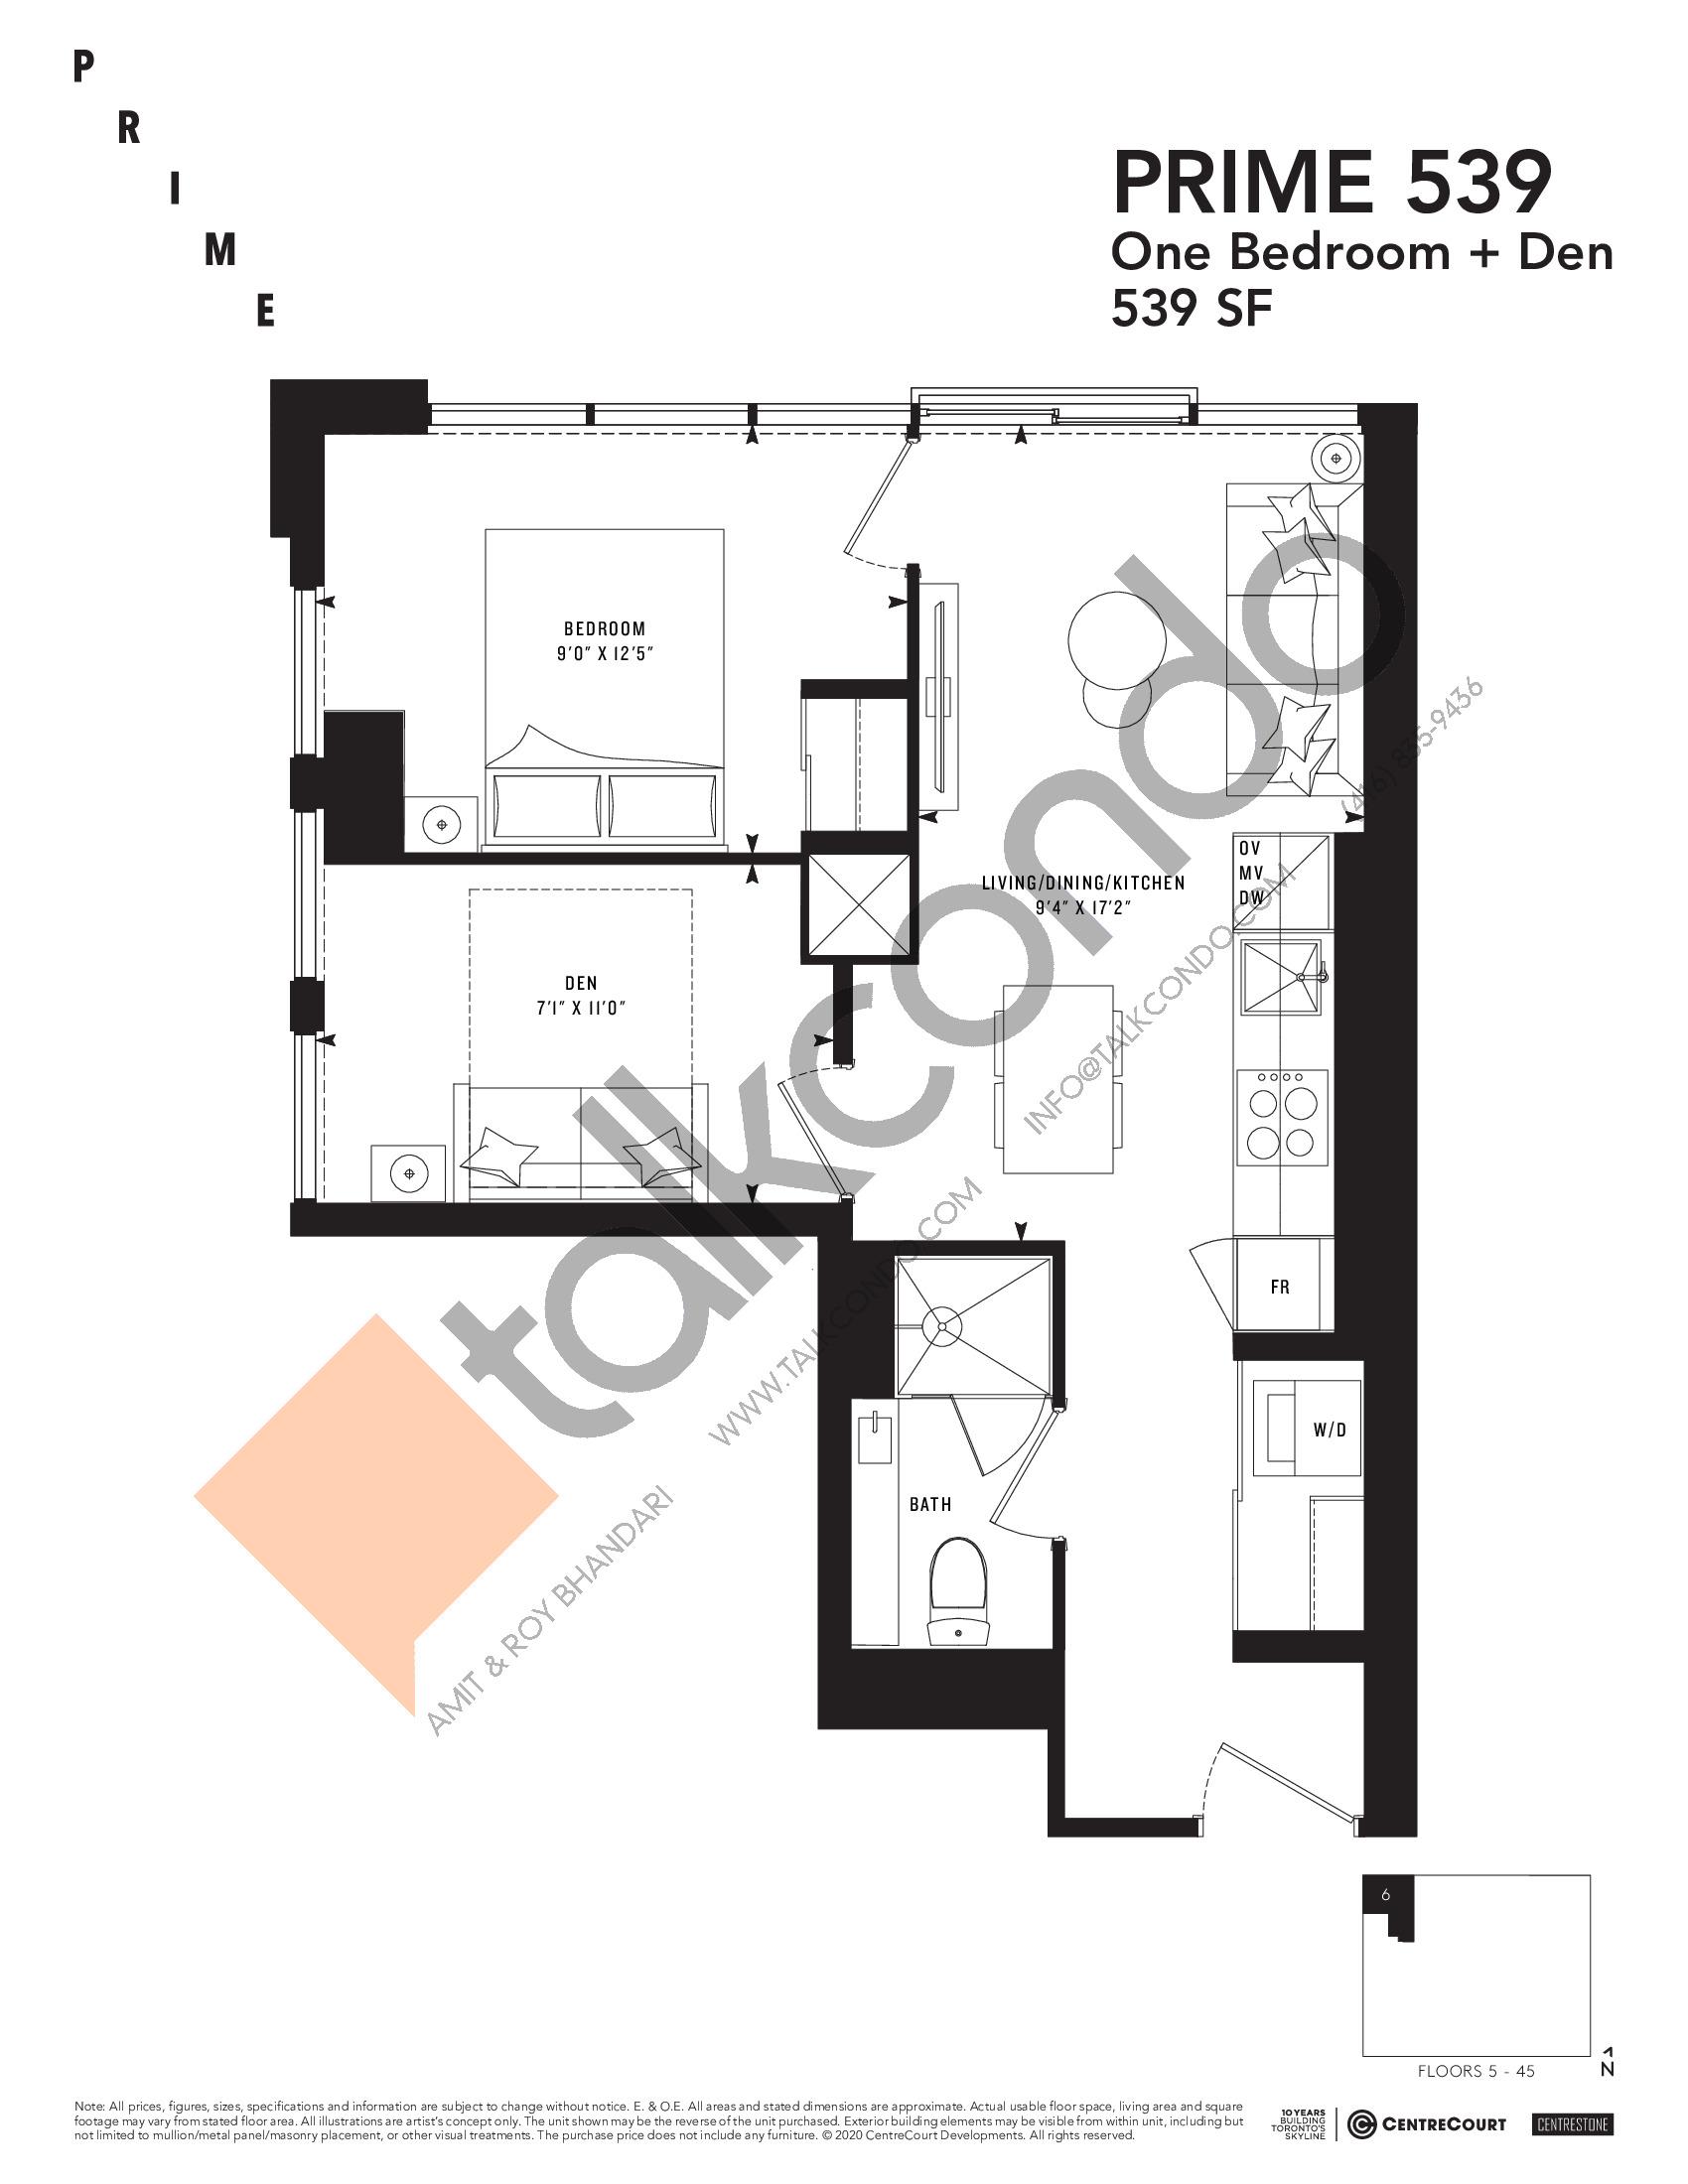 PRIME 539 Floor Plan at Prime Condos - 539 sq.ft